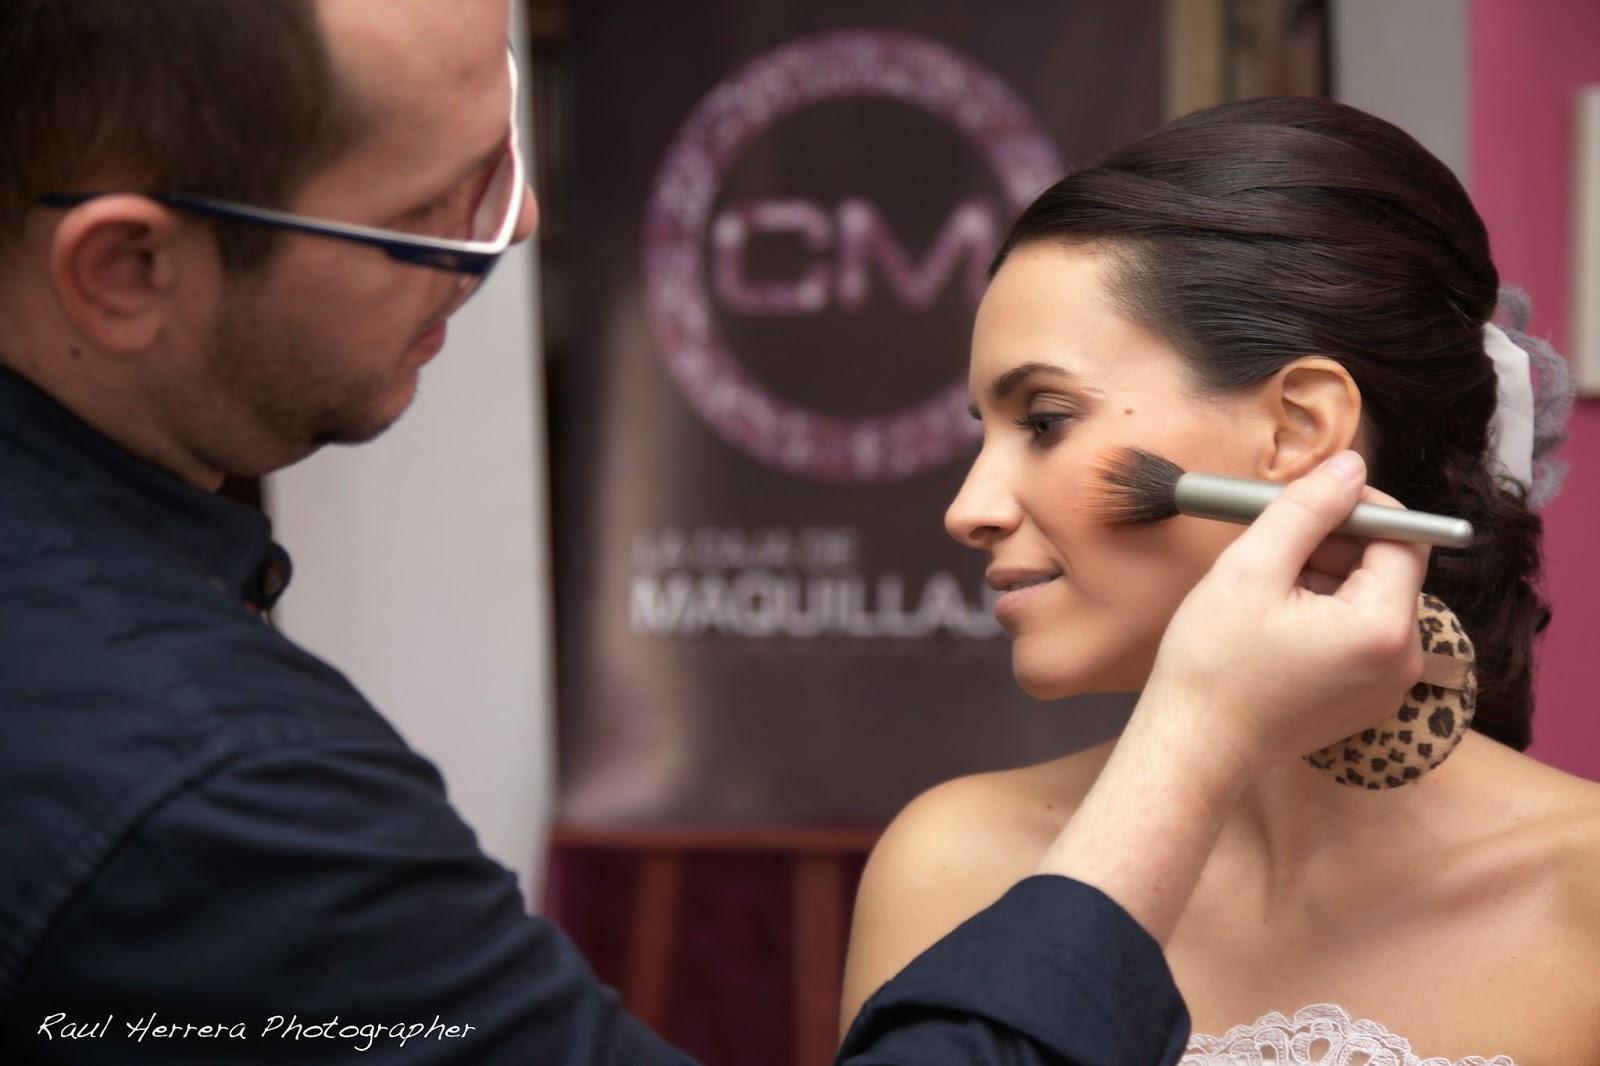 Maquillaje realizado por Manuel Andrade